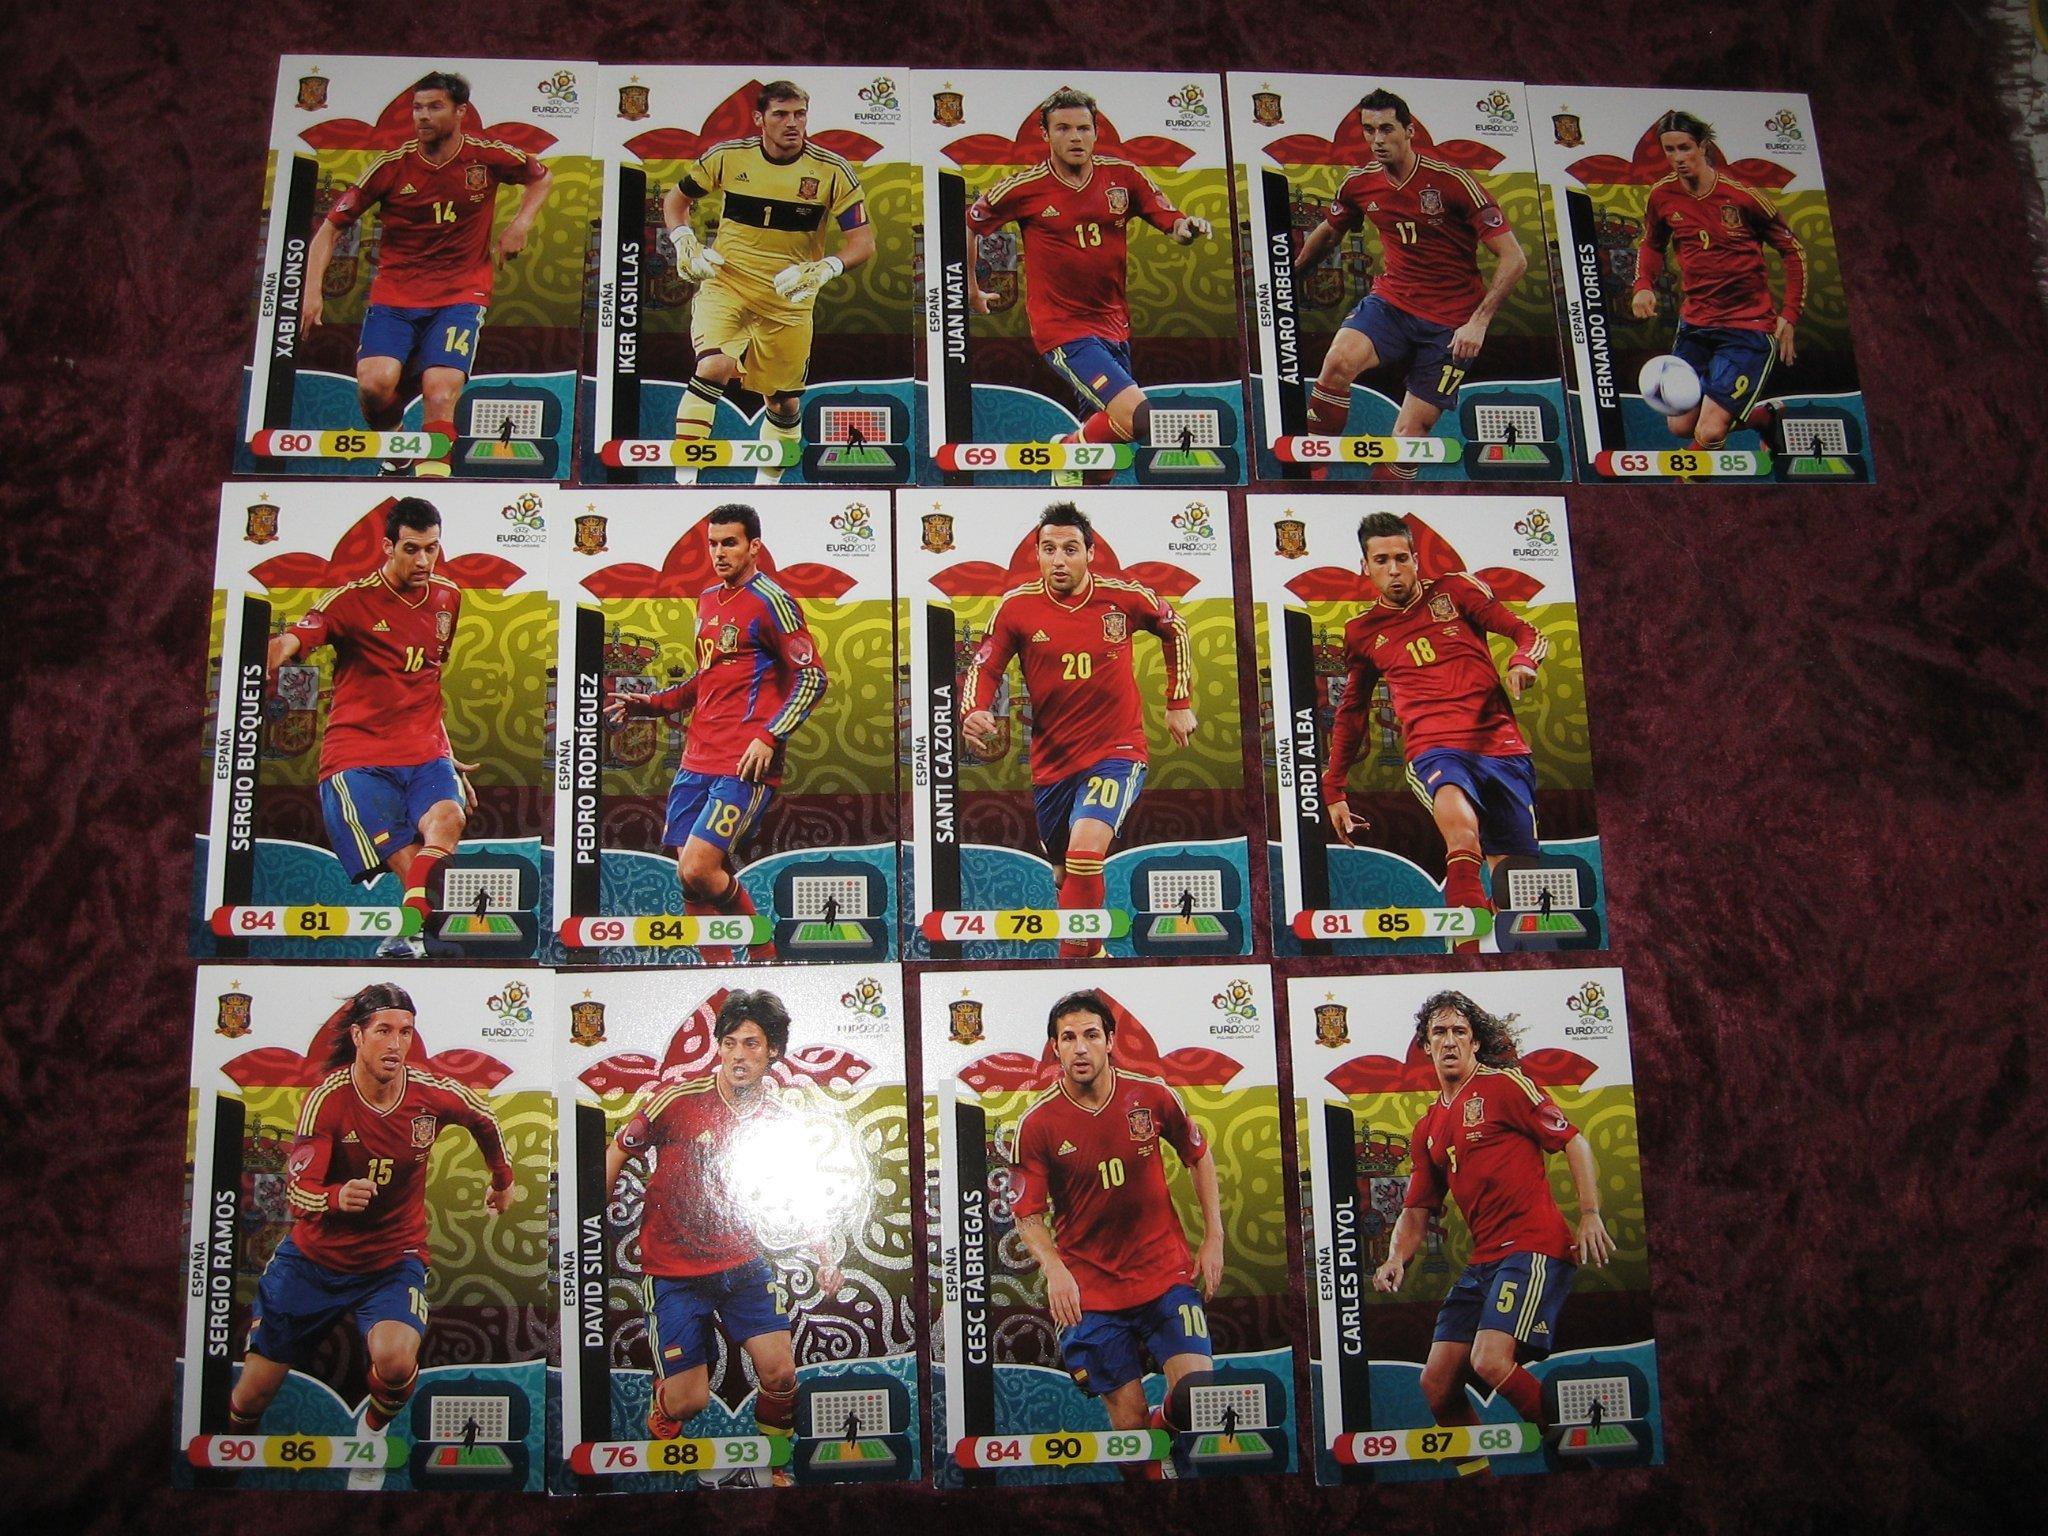 13 St Spanien Fotbolls Kort Euro 2012 377077230 ᐈ Kop Pa Tradera